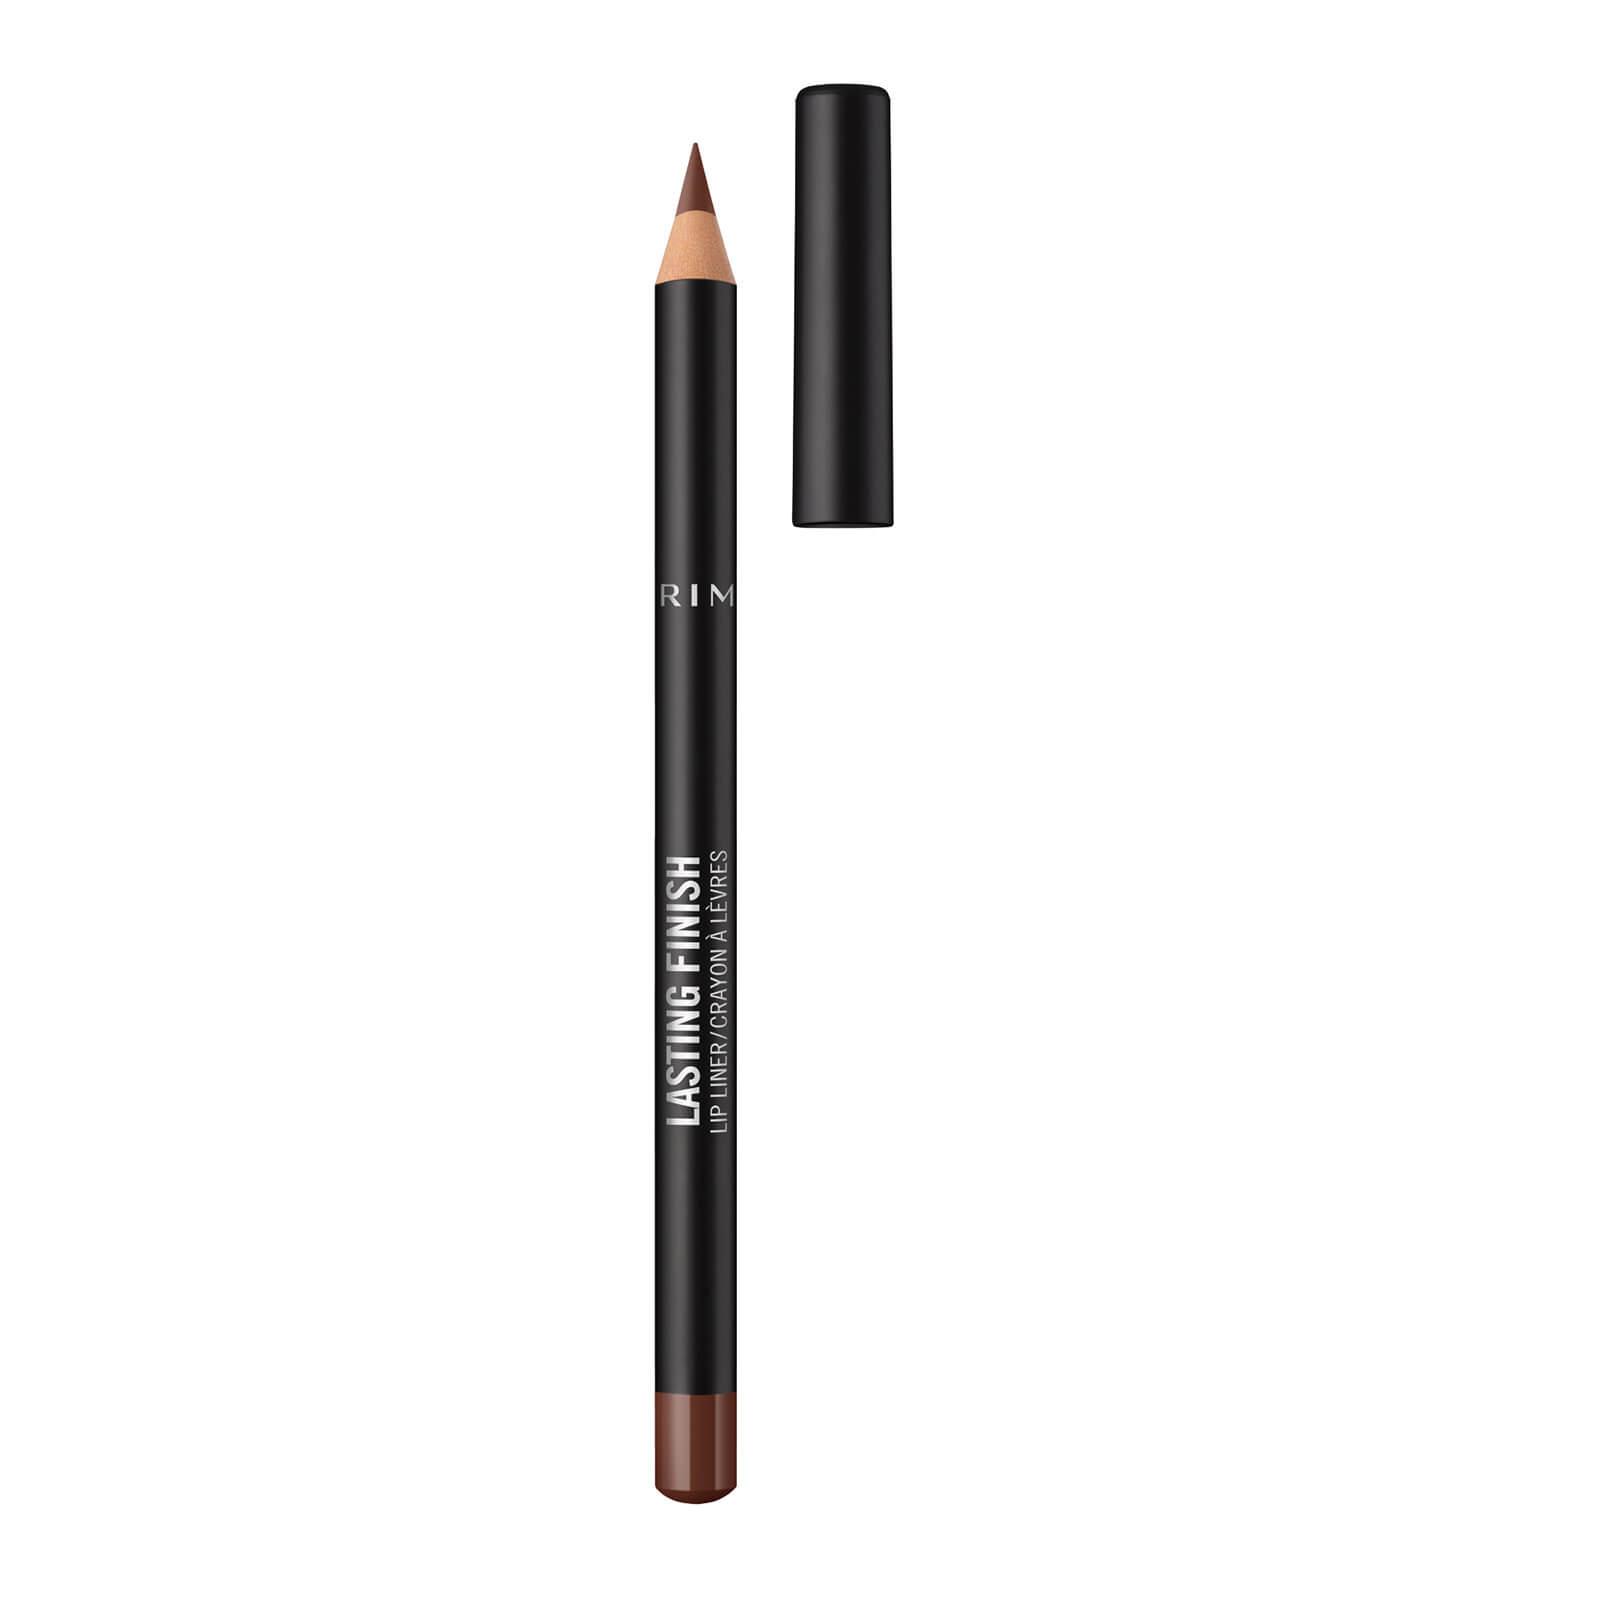 Купить Rimmel Lasting Finish 8HR Lip Liner (Various Shades) - Brown Pie 790